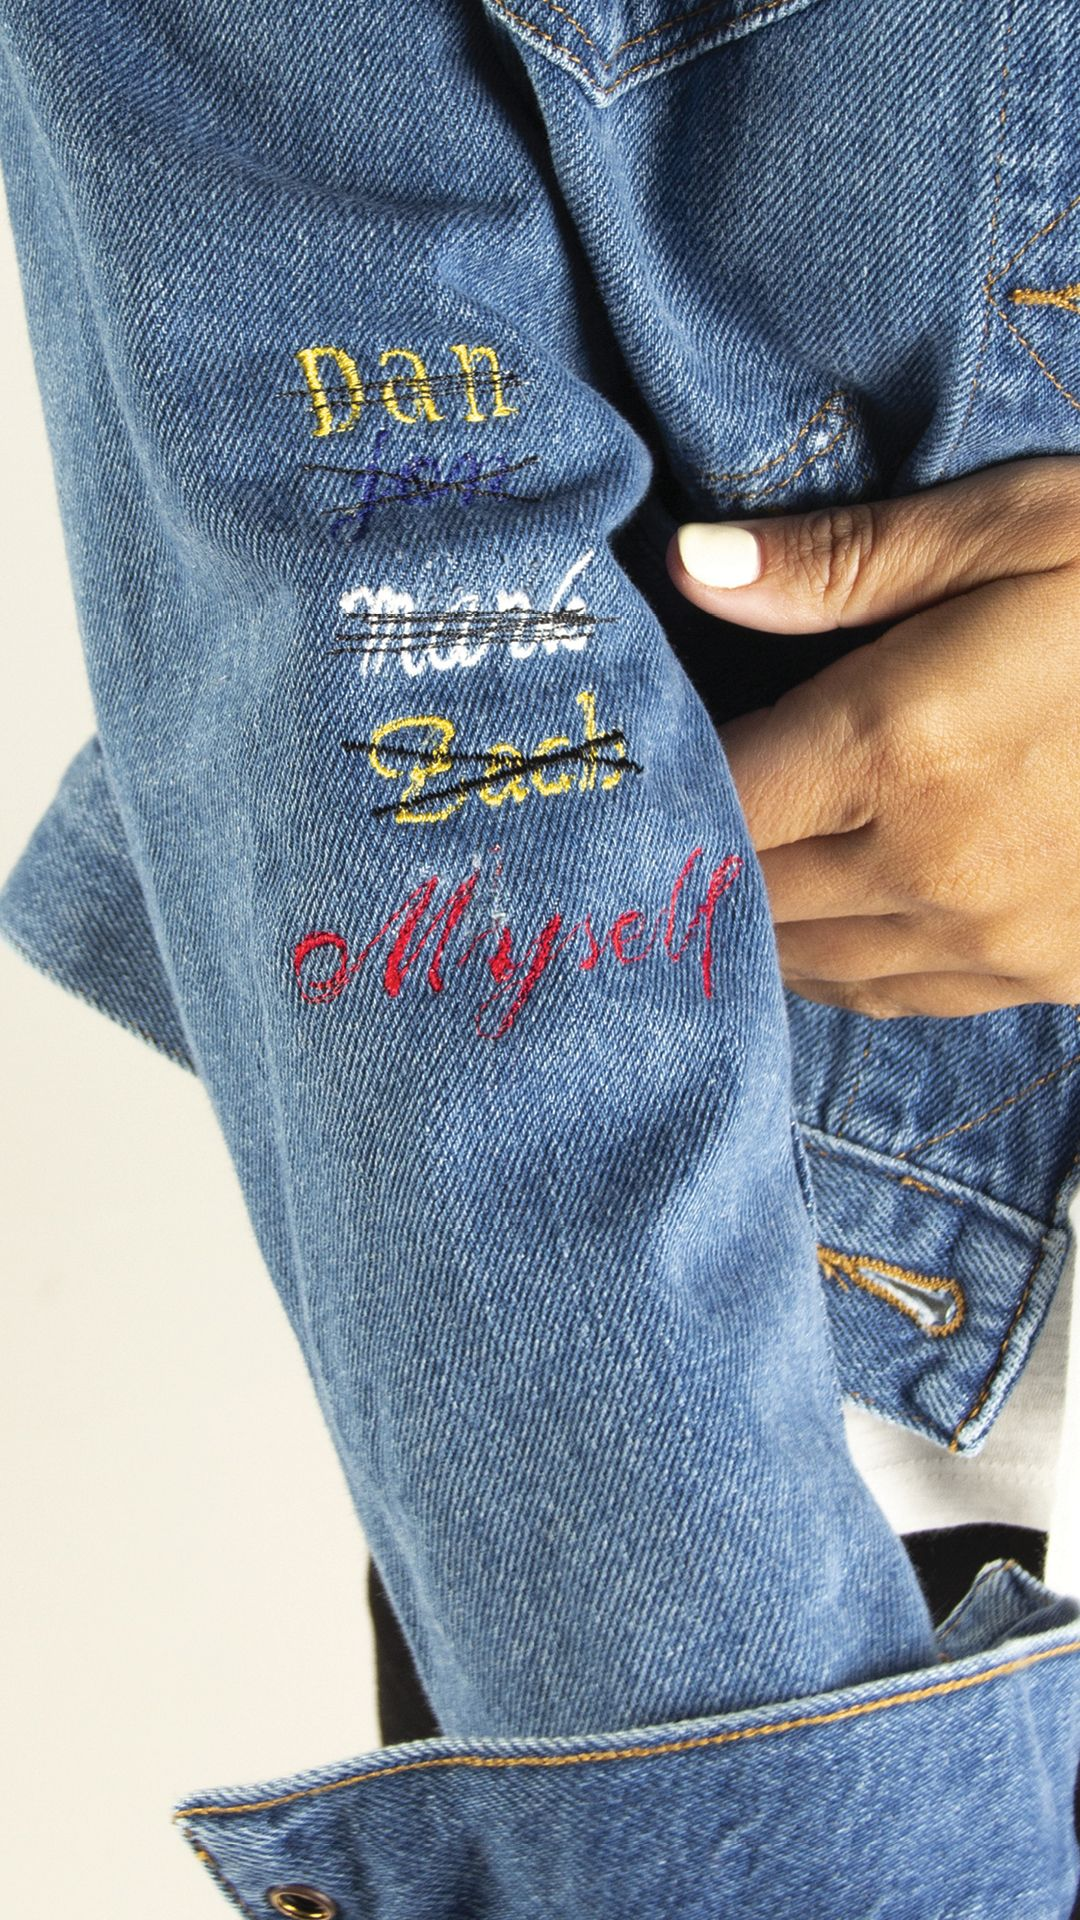 Embroidered jean jacket denim self love brand name